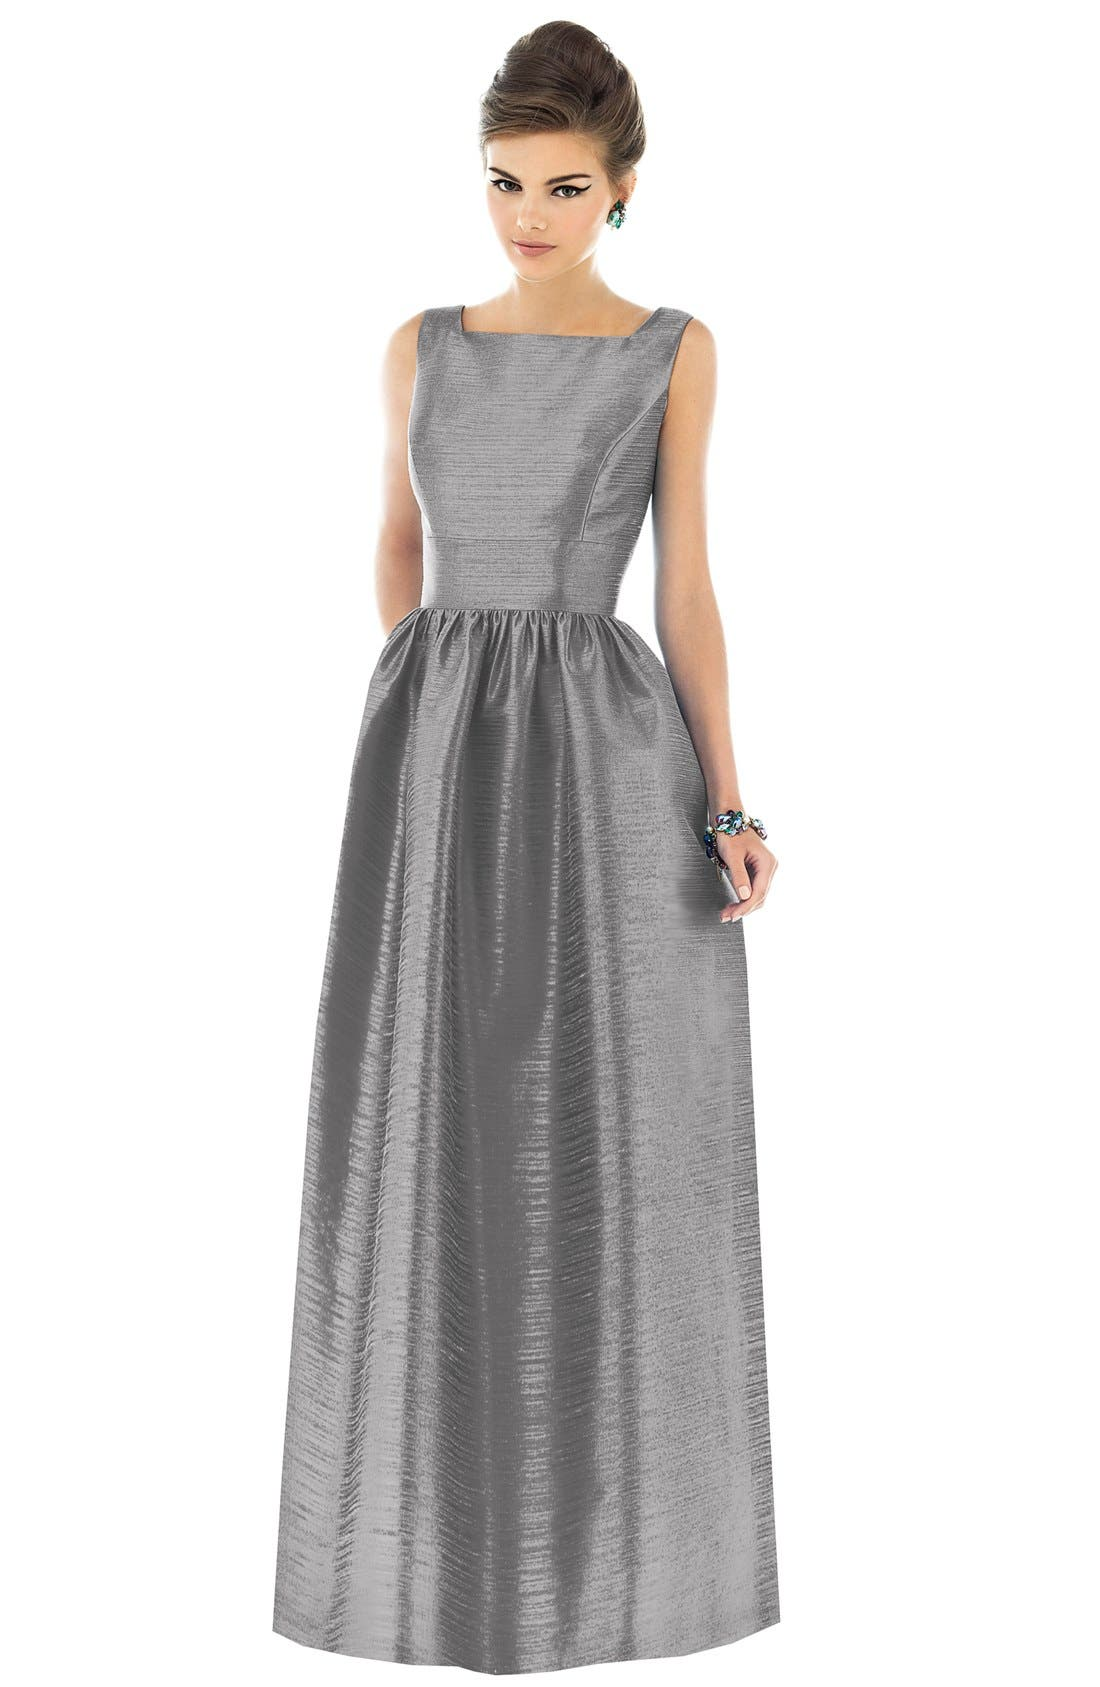 Main Image - Alfred Sung Square Neck Dupioni Full Length Dress